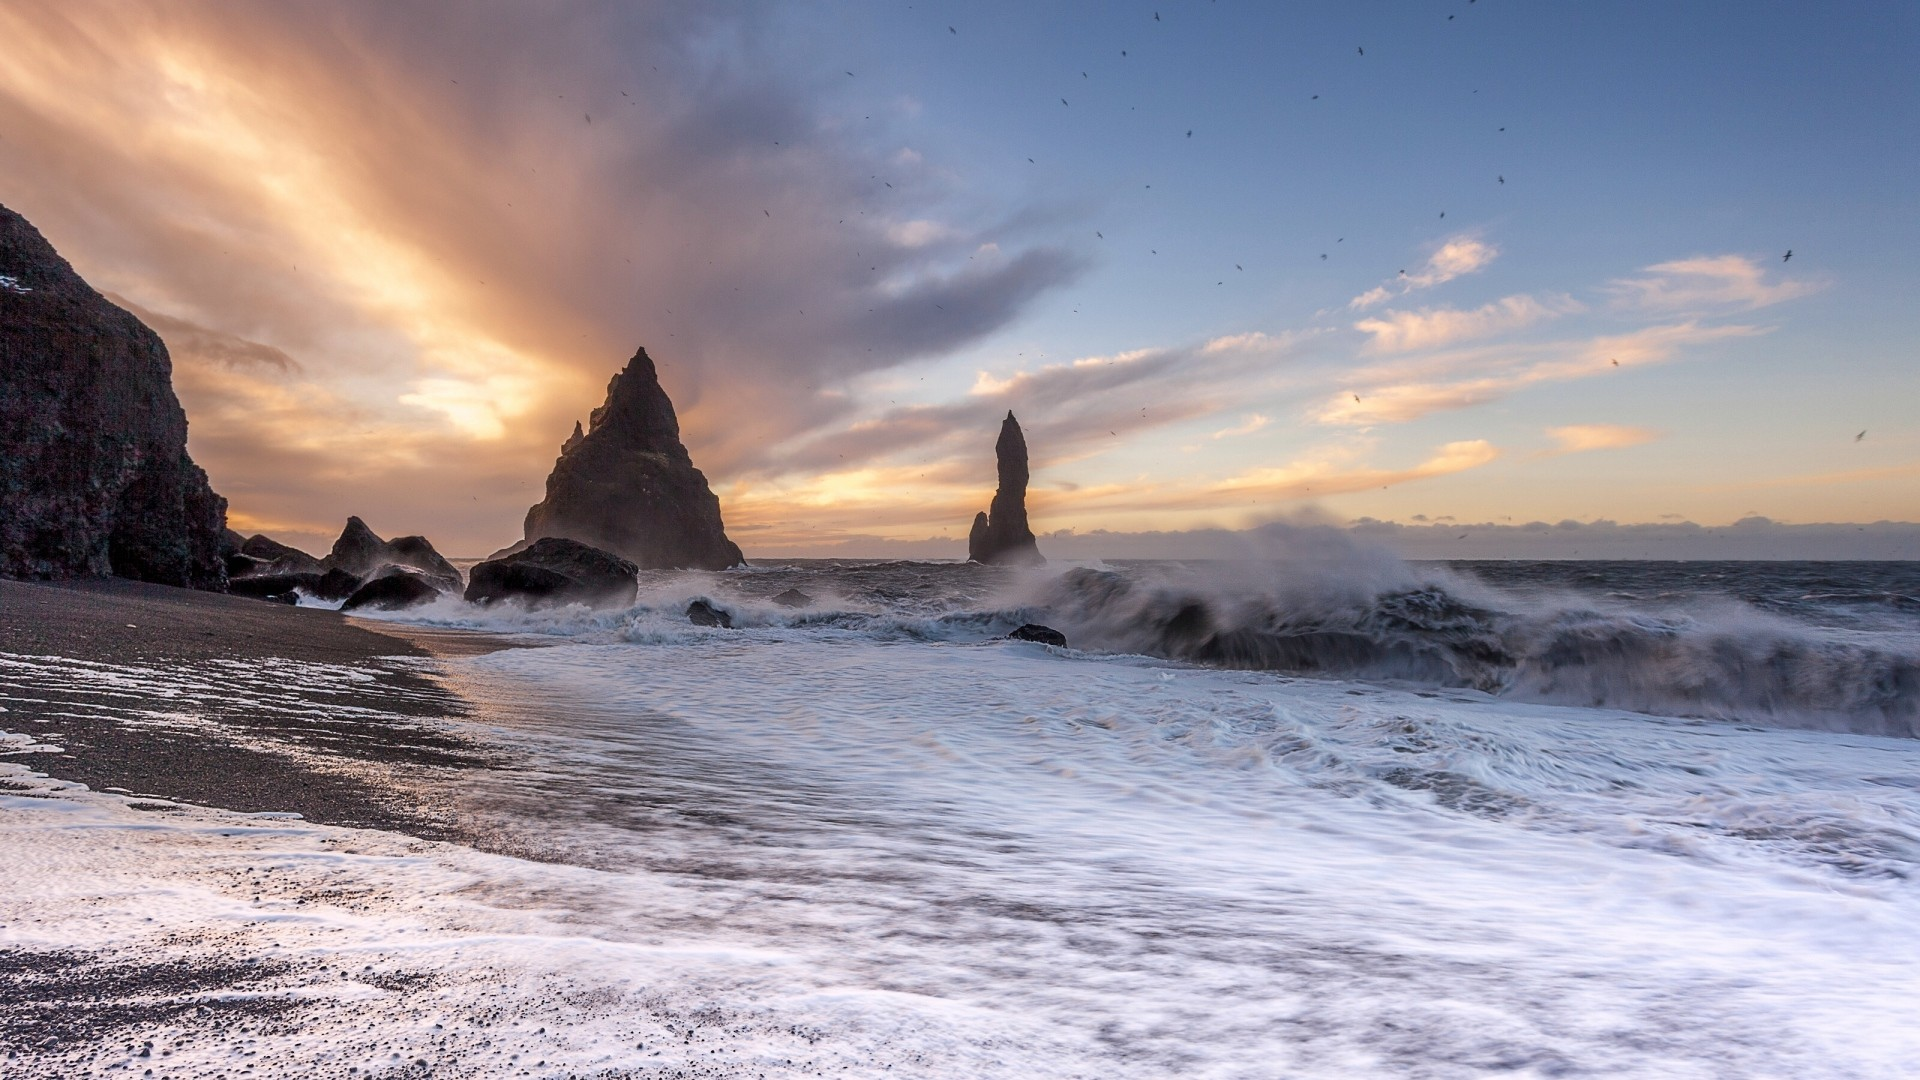 Wallpaper vik, iceland, atlantic ocean, surf, sunset